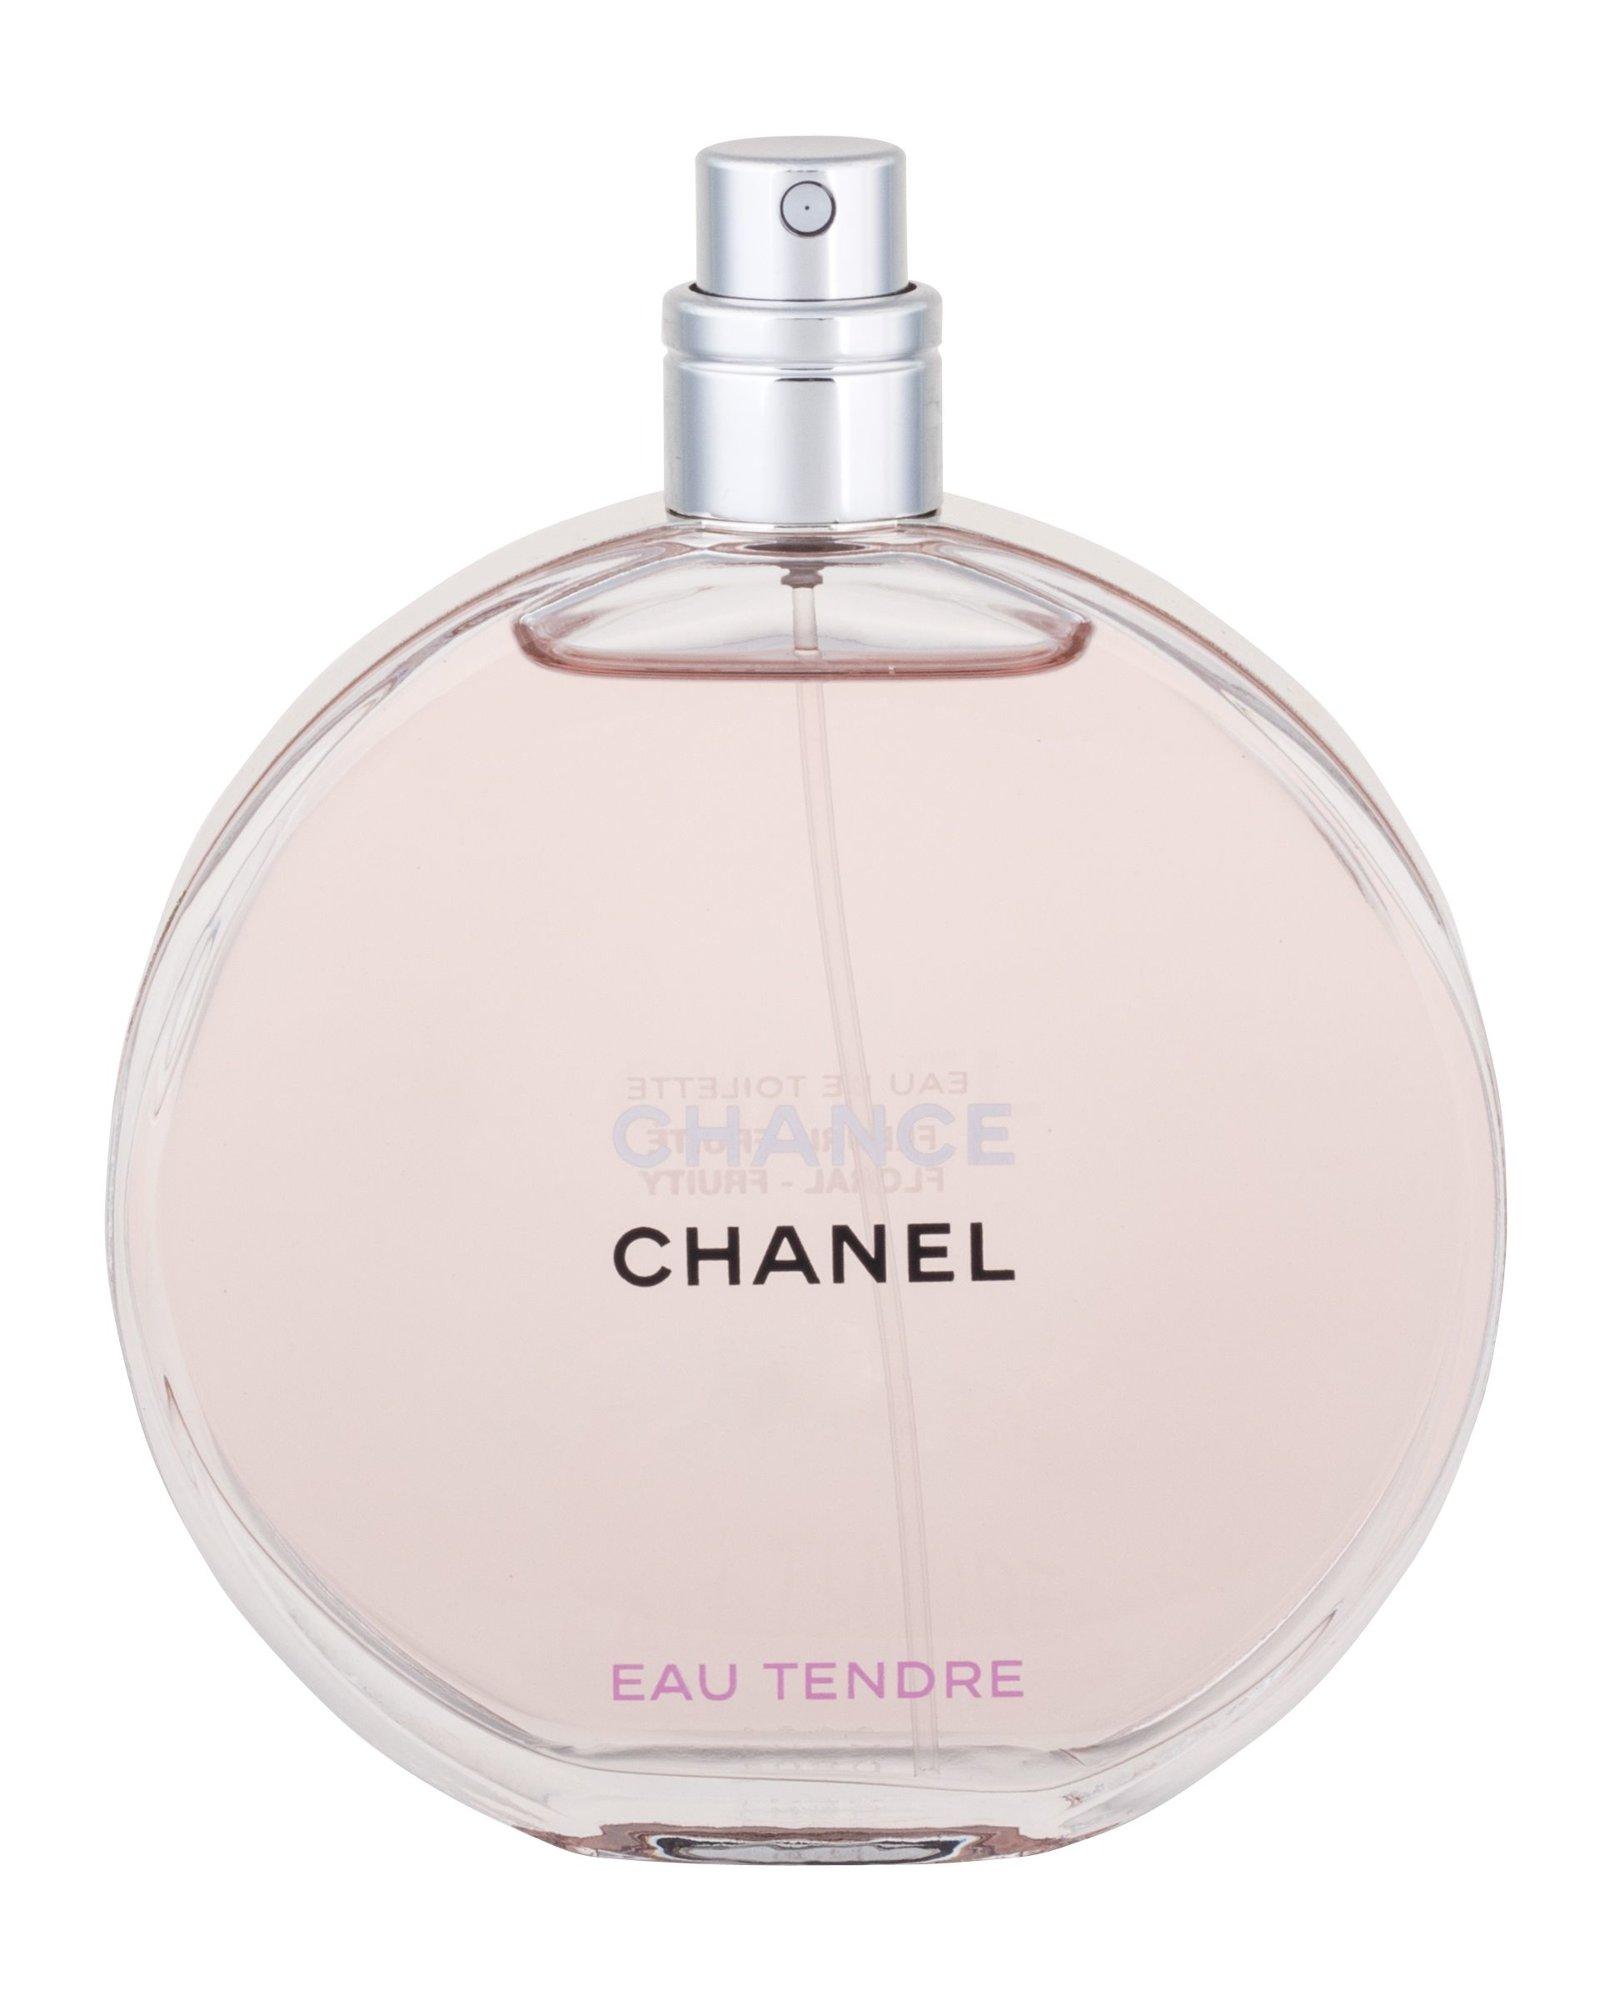 Chanel Chance EDT 100ml  Eau Tendre